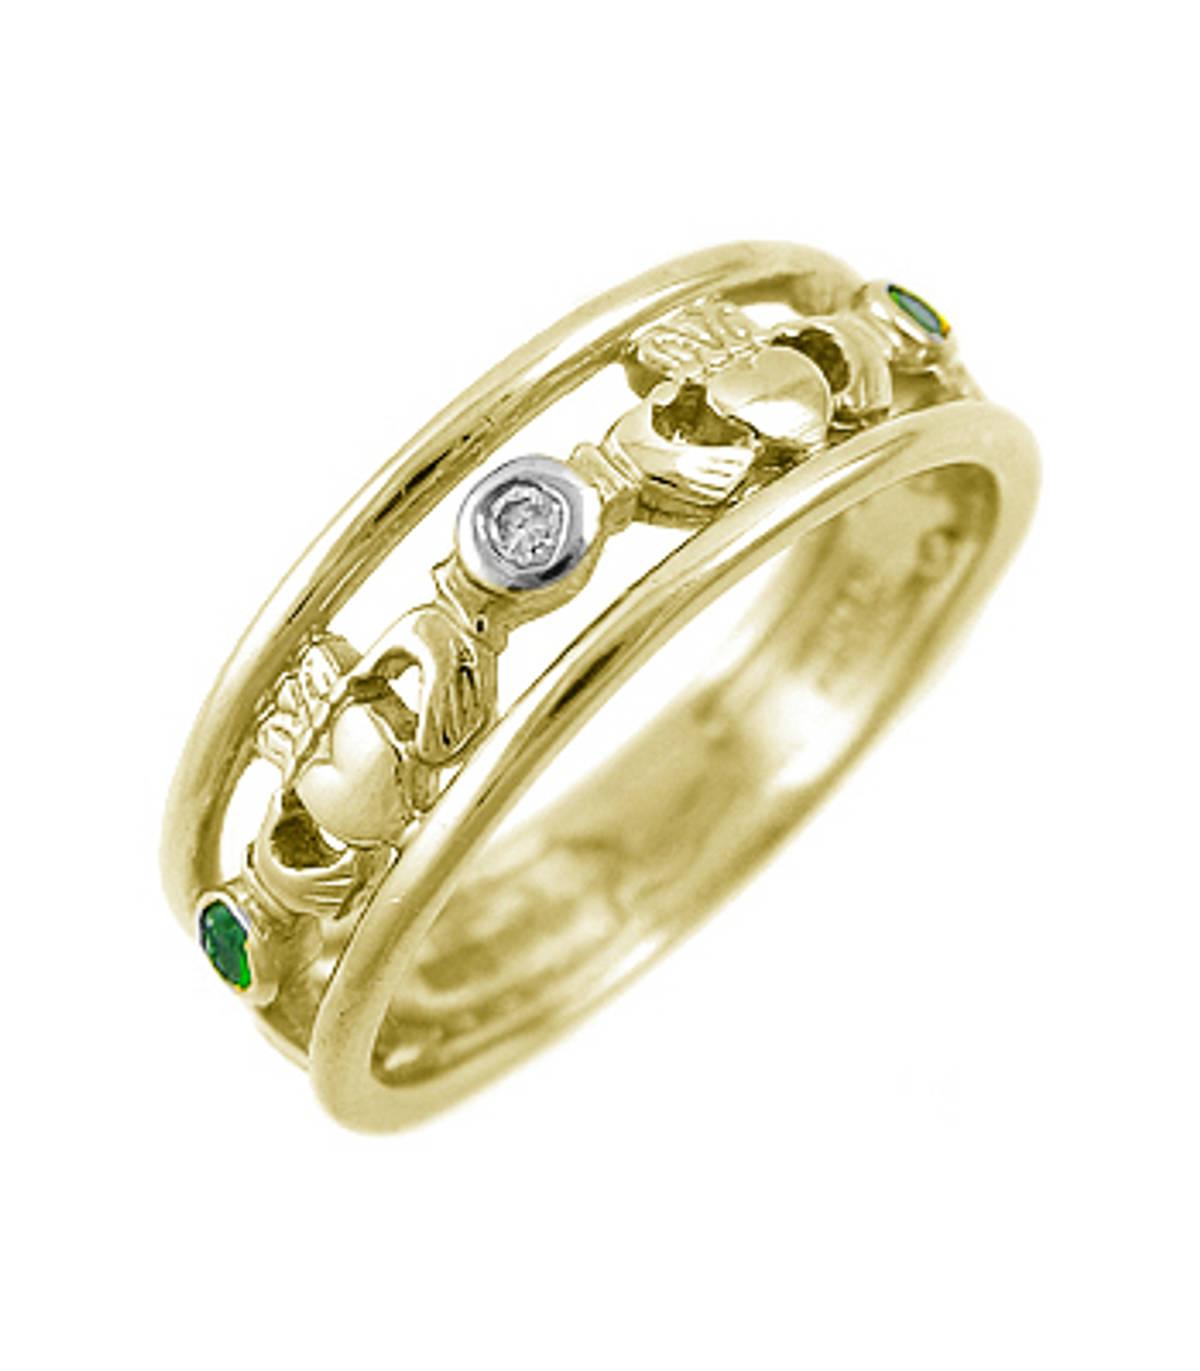 Irish made14 carat yellow gold 0.10cts emerald/0.02cts diamonds claddagh engagement ring